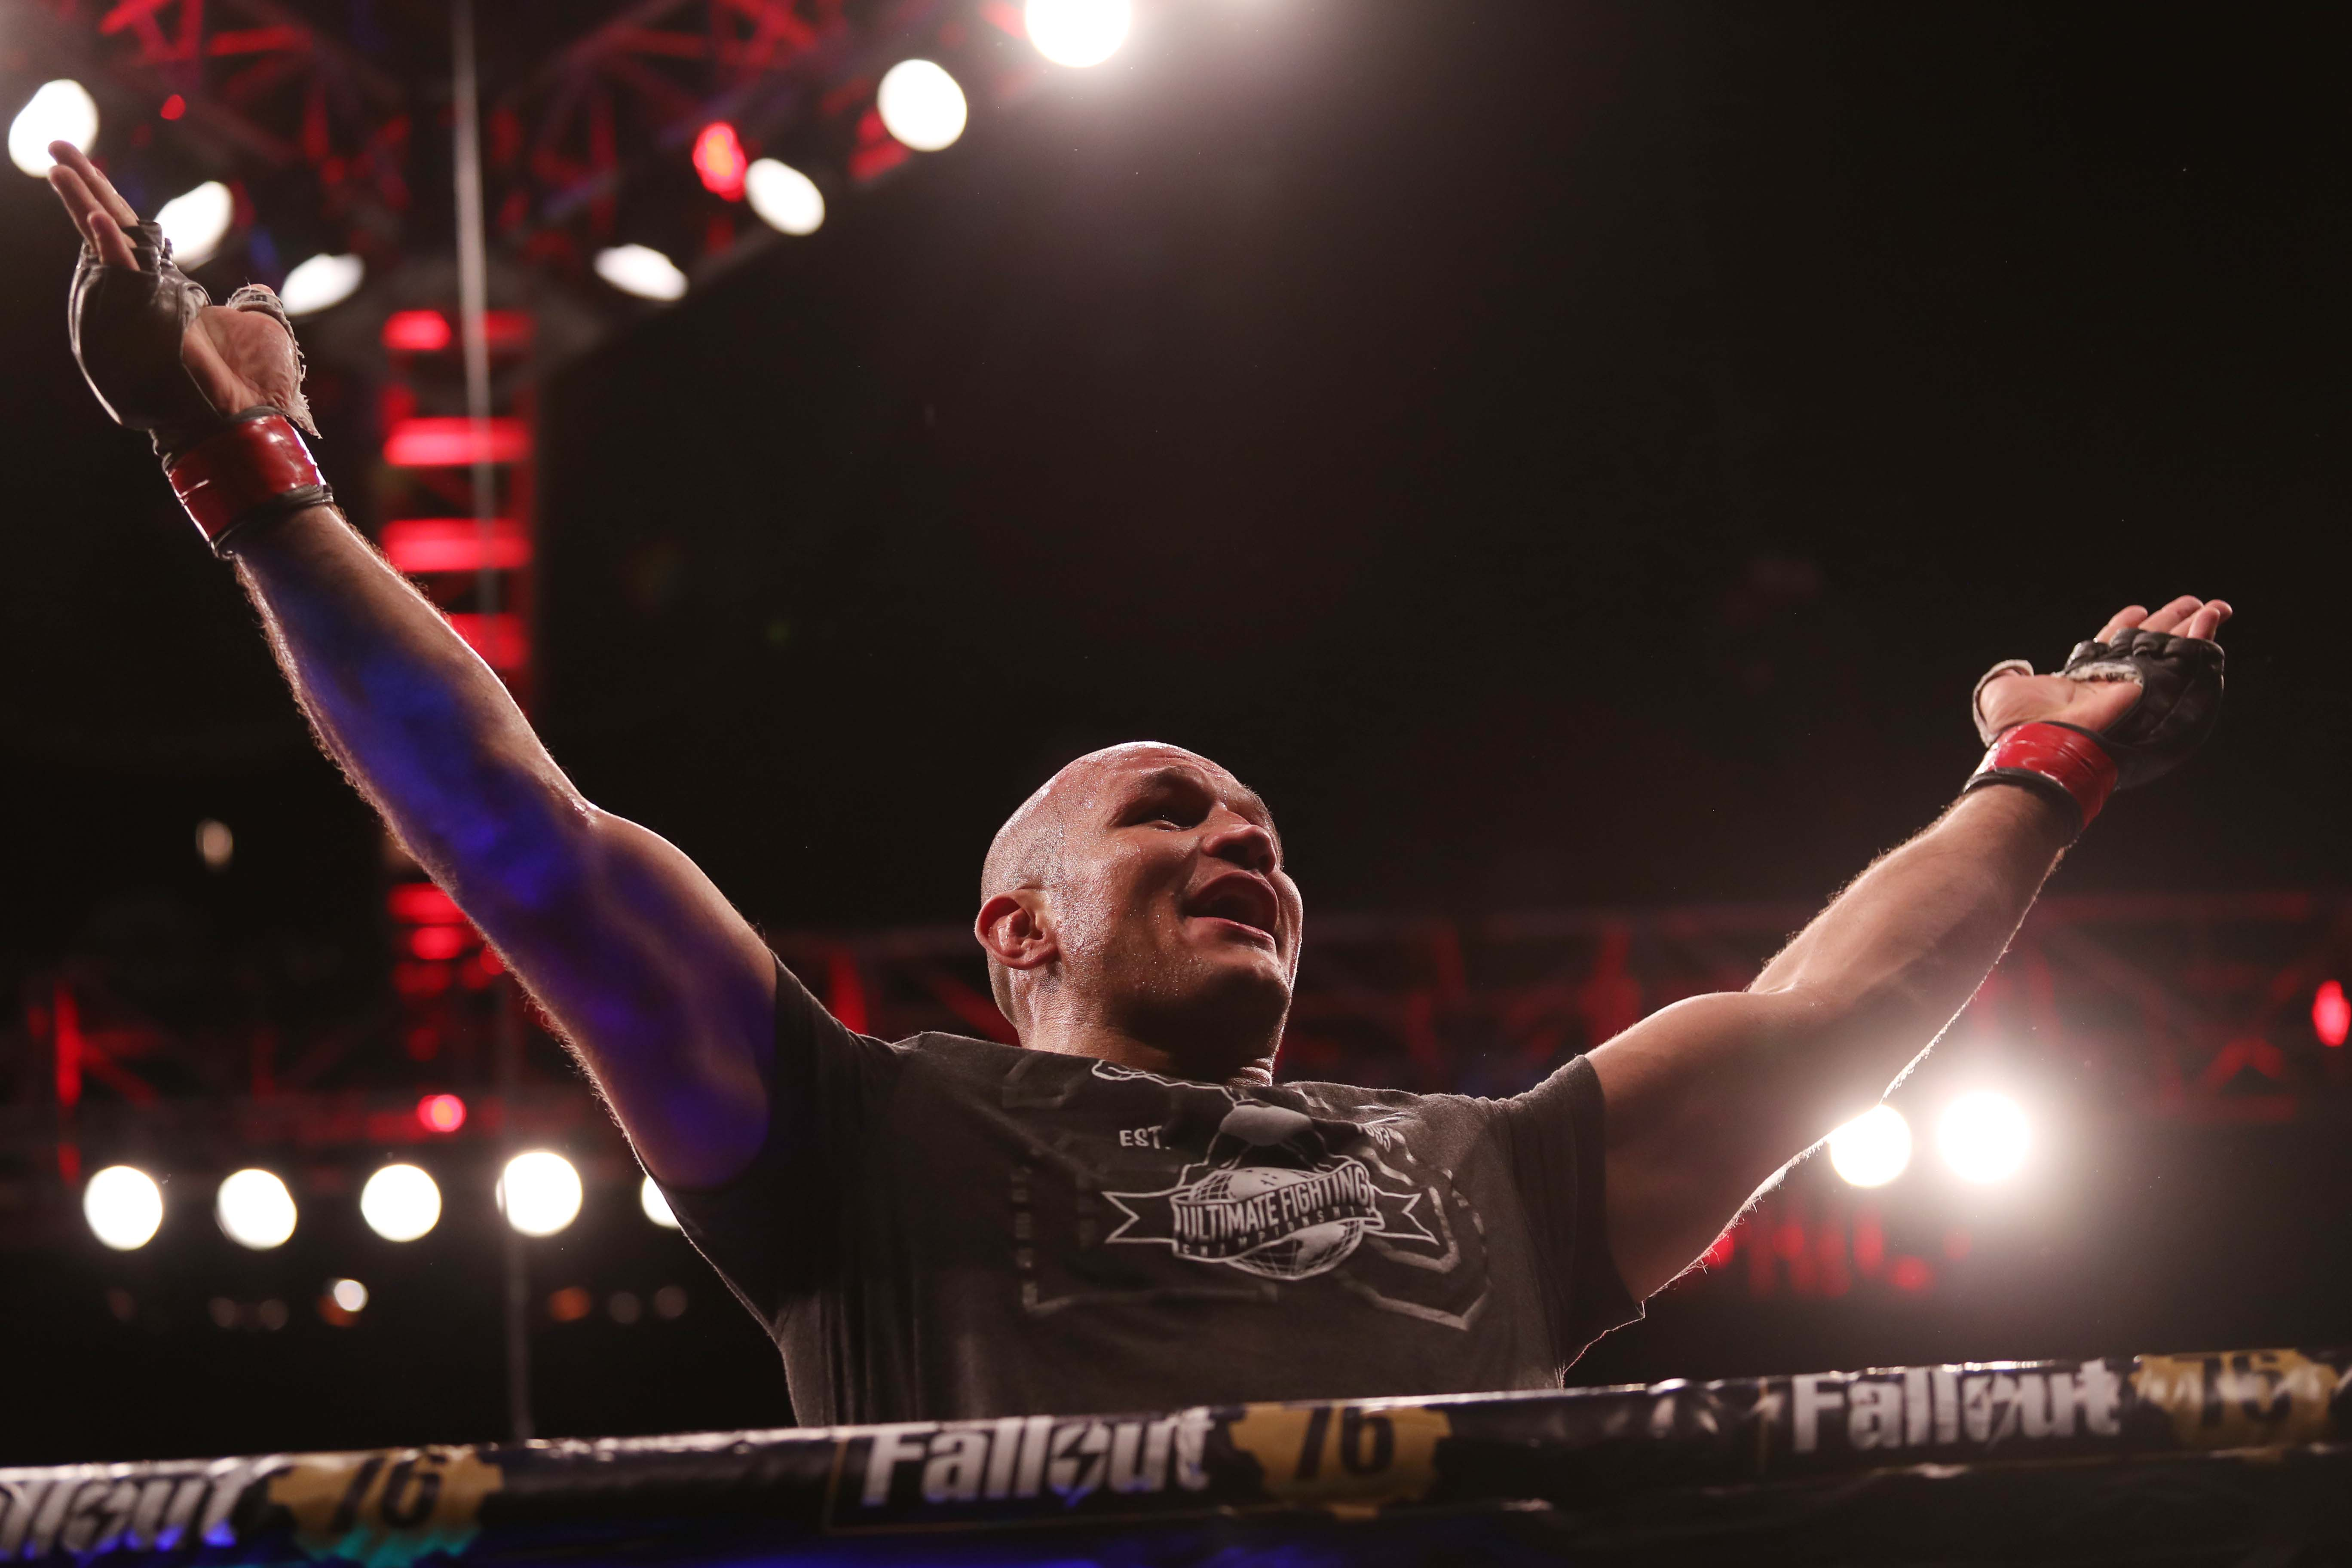 MMA: UFC Fight Night-Adelaide-Dos Santos vs Tuivasa